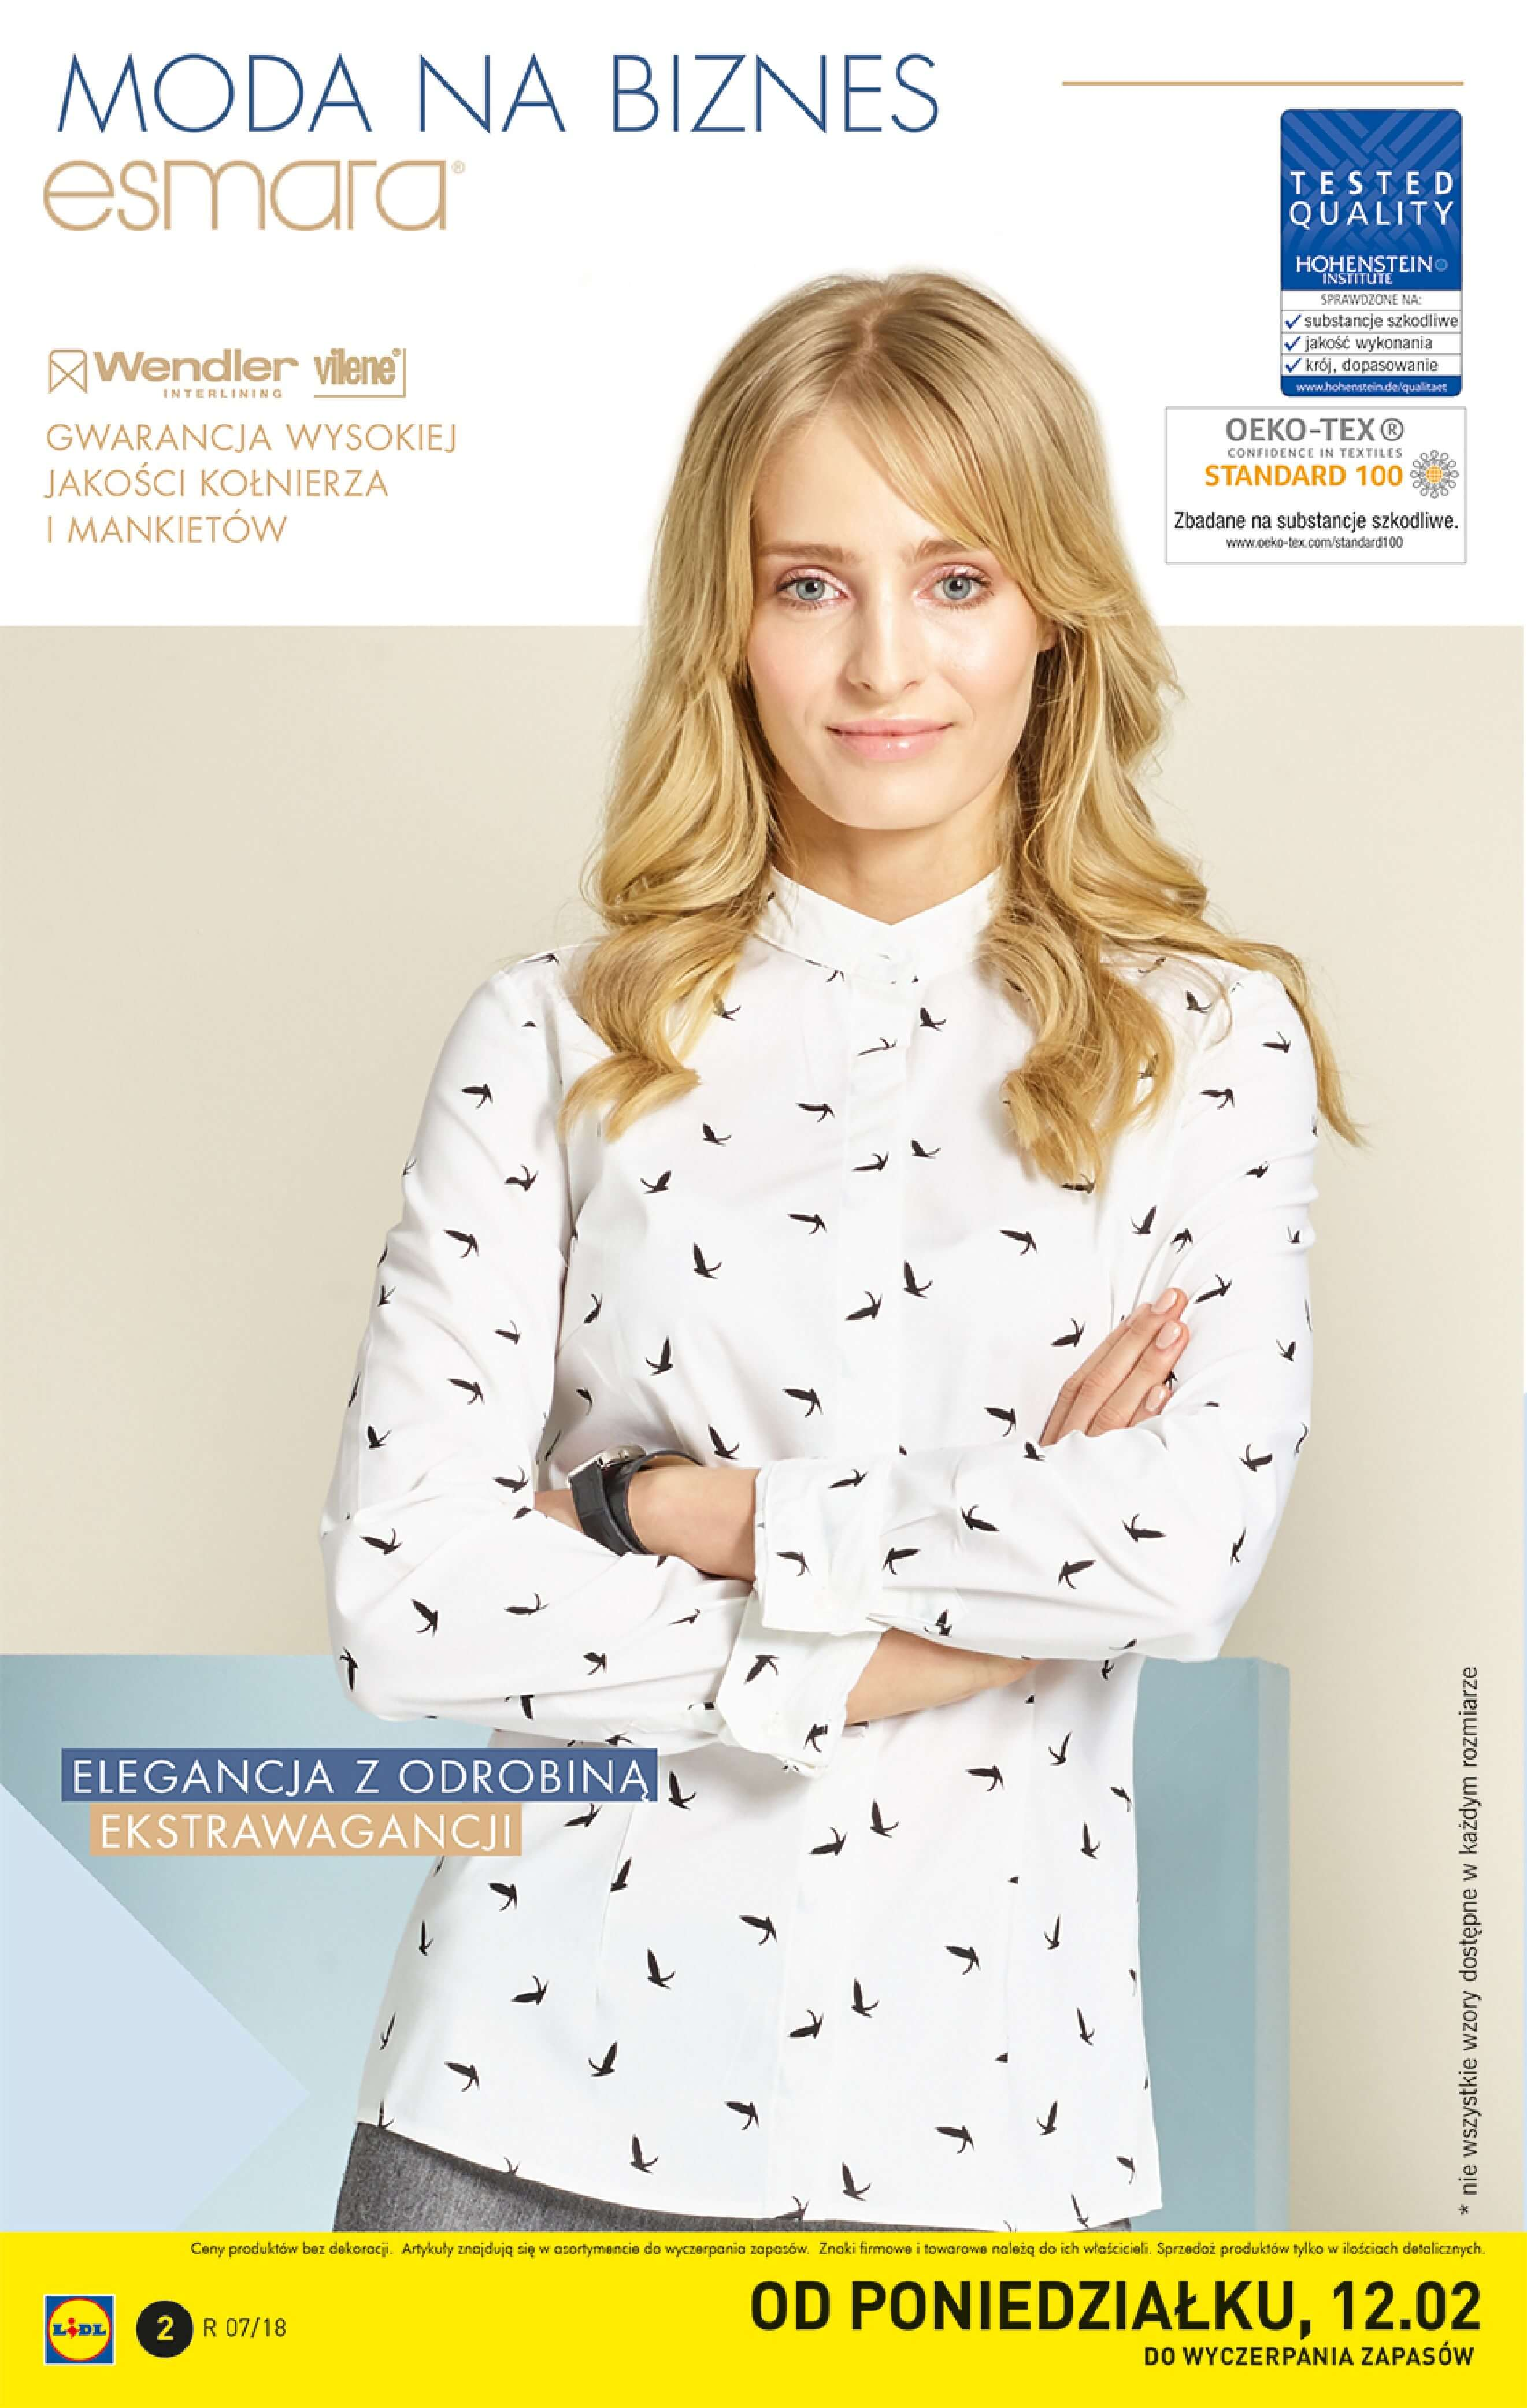 Gazetka Lidl - Katalog-11.02.2018-18.02.2018-page-2